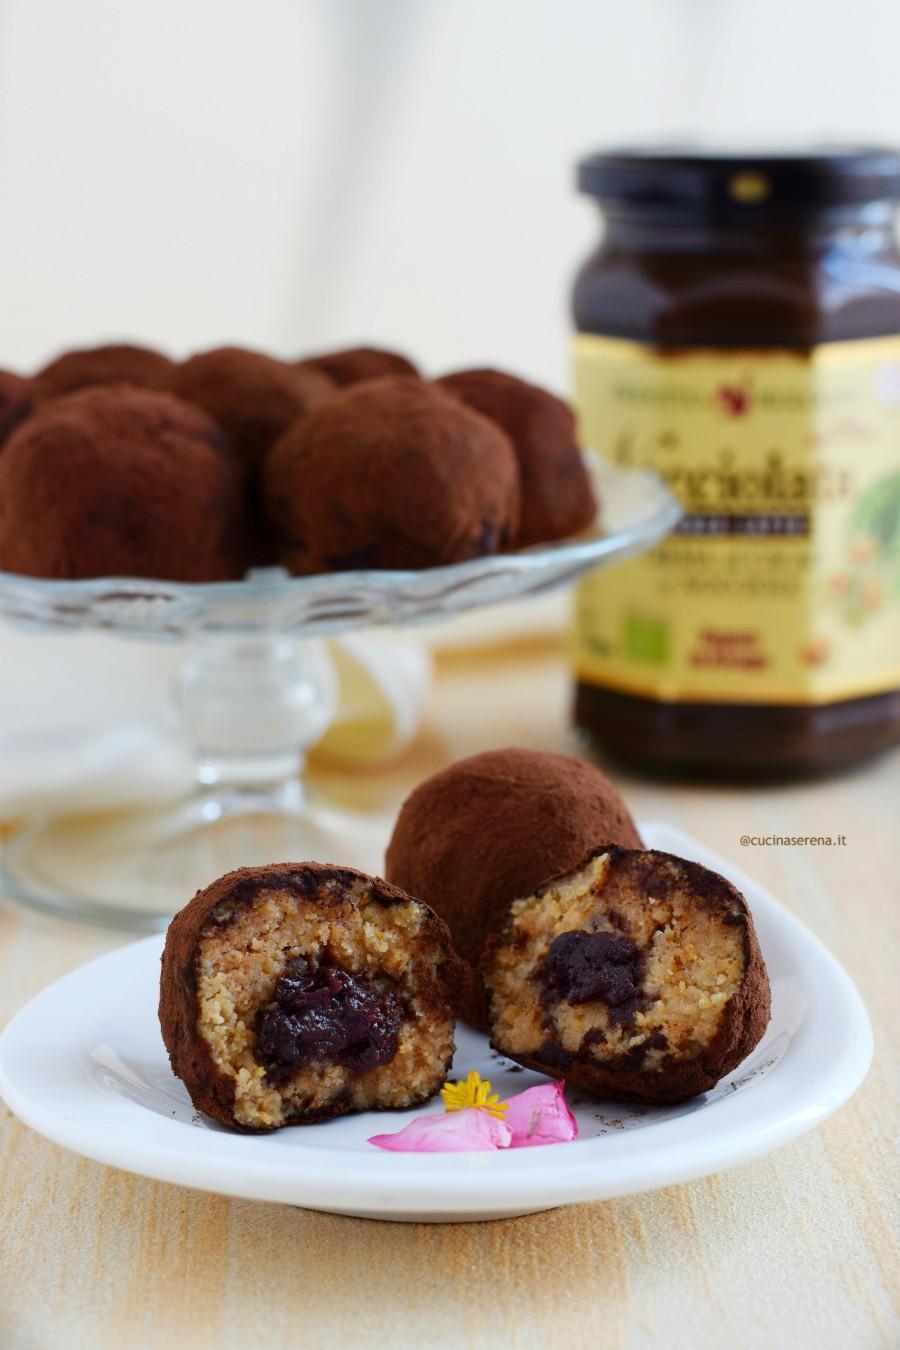 Tiramisù truffle recipe without eggs